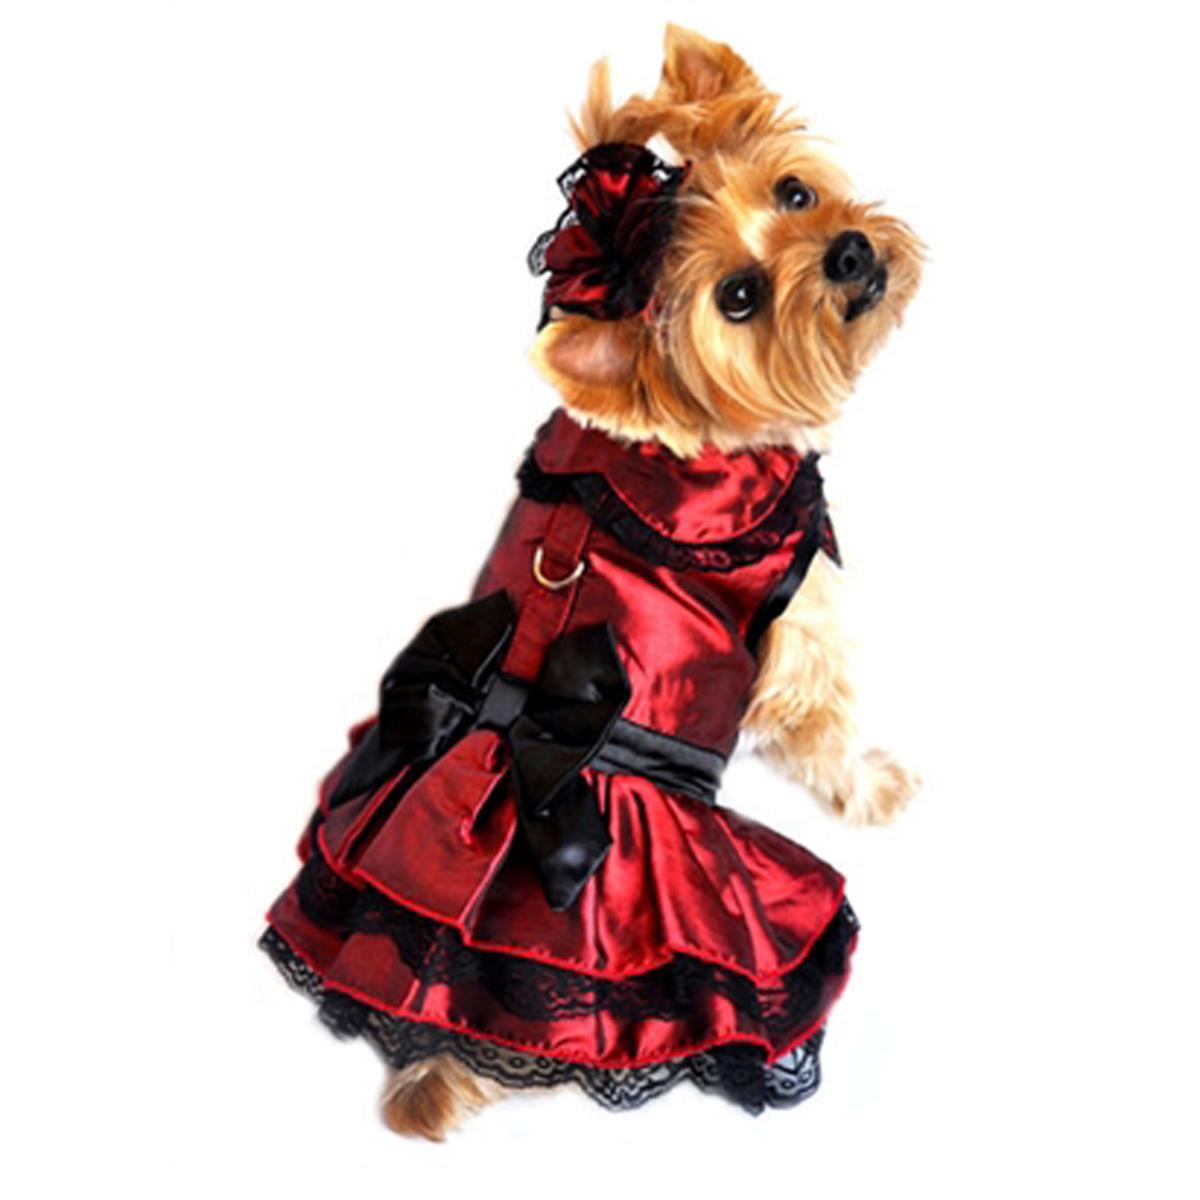 Iridescent Burgundy Satin Dog Dress with Headpiece